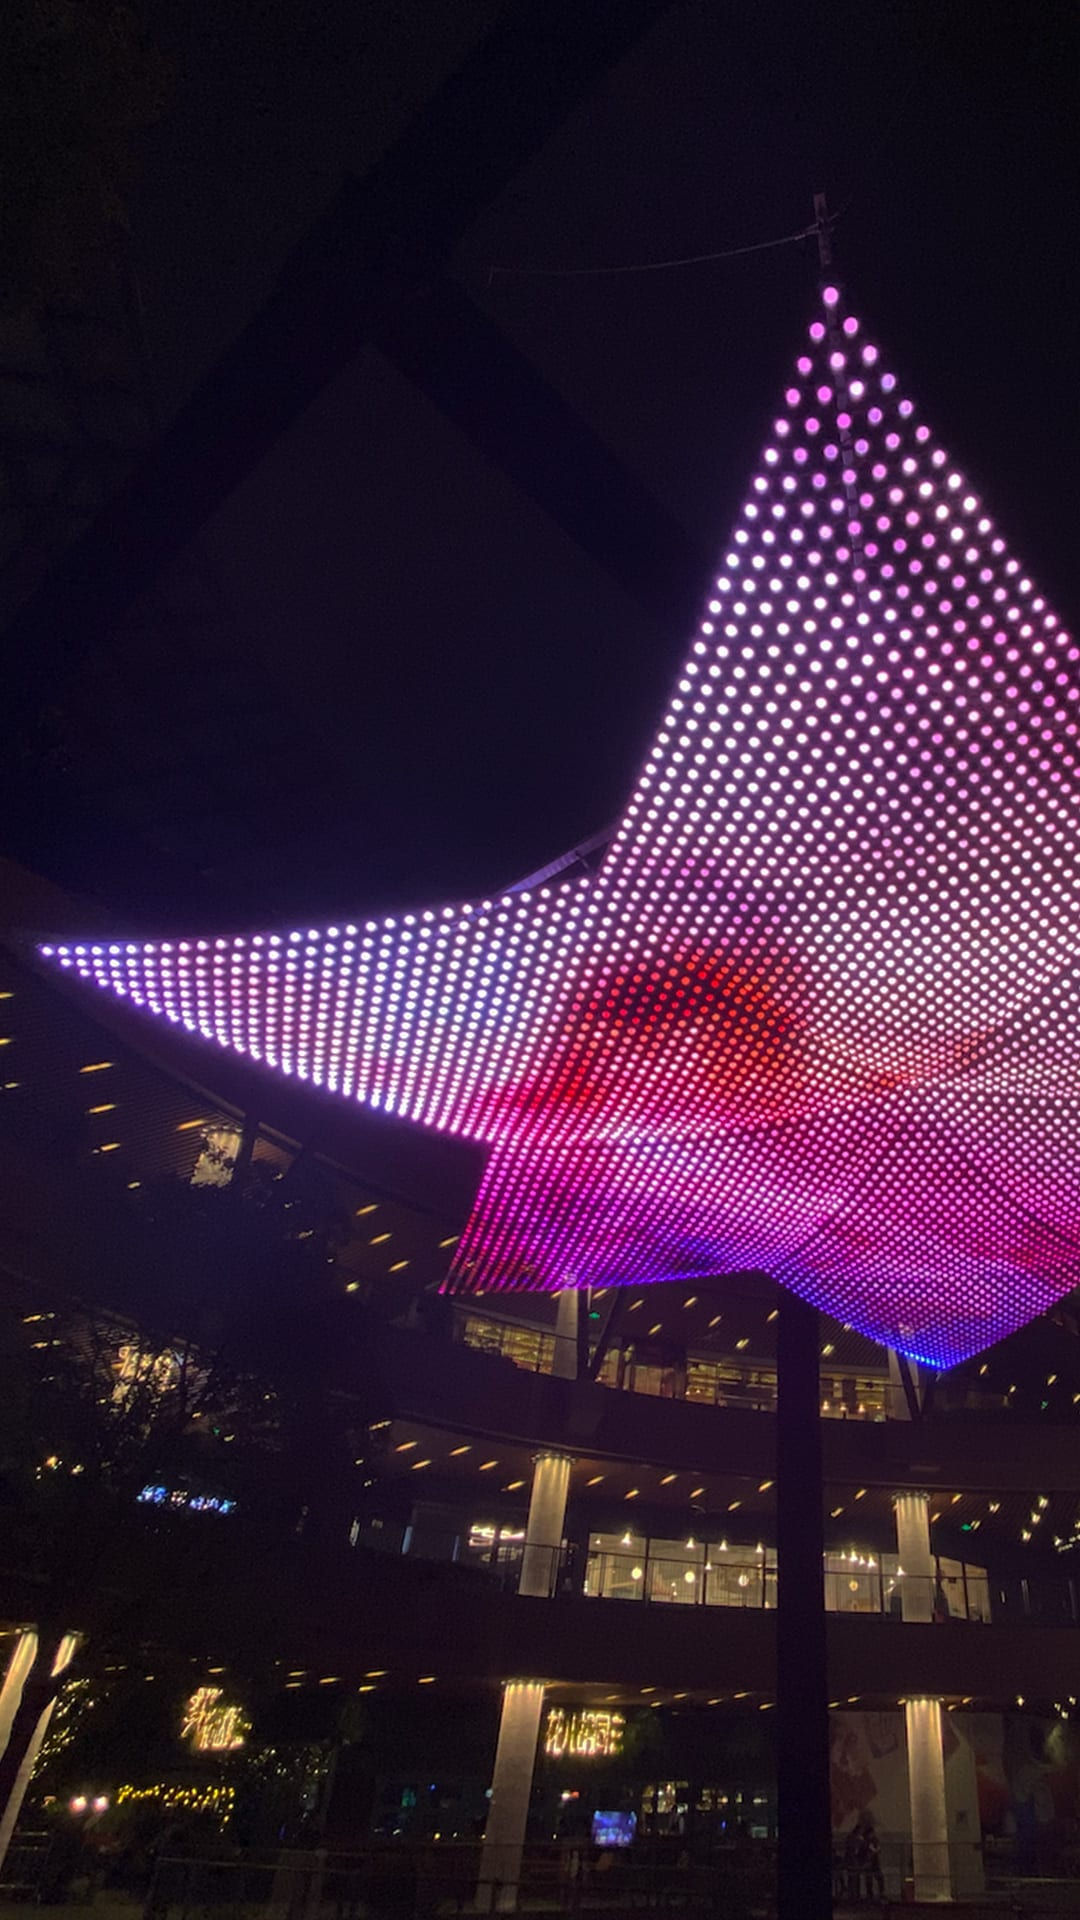 Christopher Schardt's Constellation Lights up the Sky | MASSIVart - Public Art